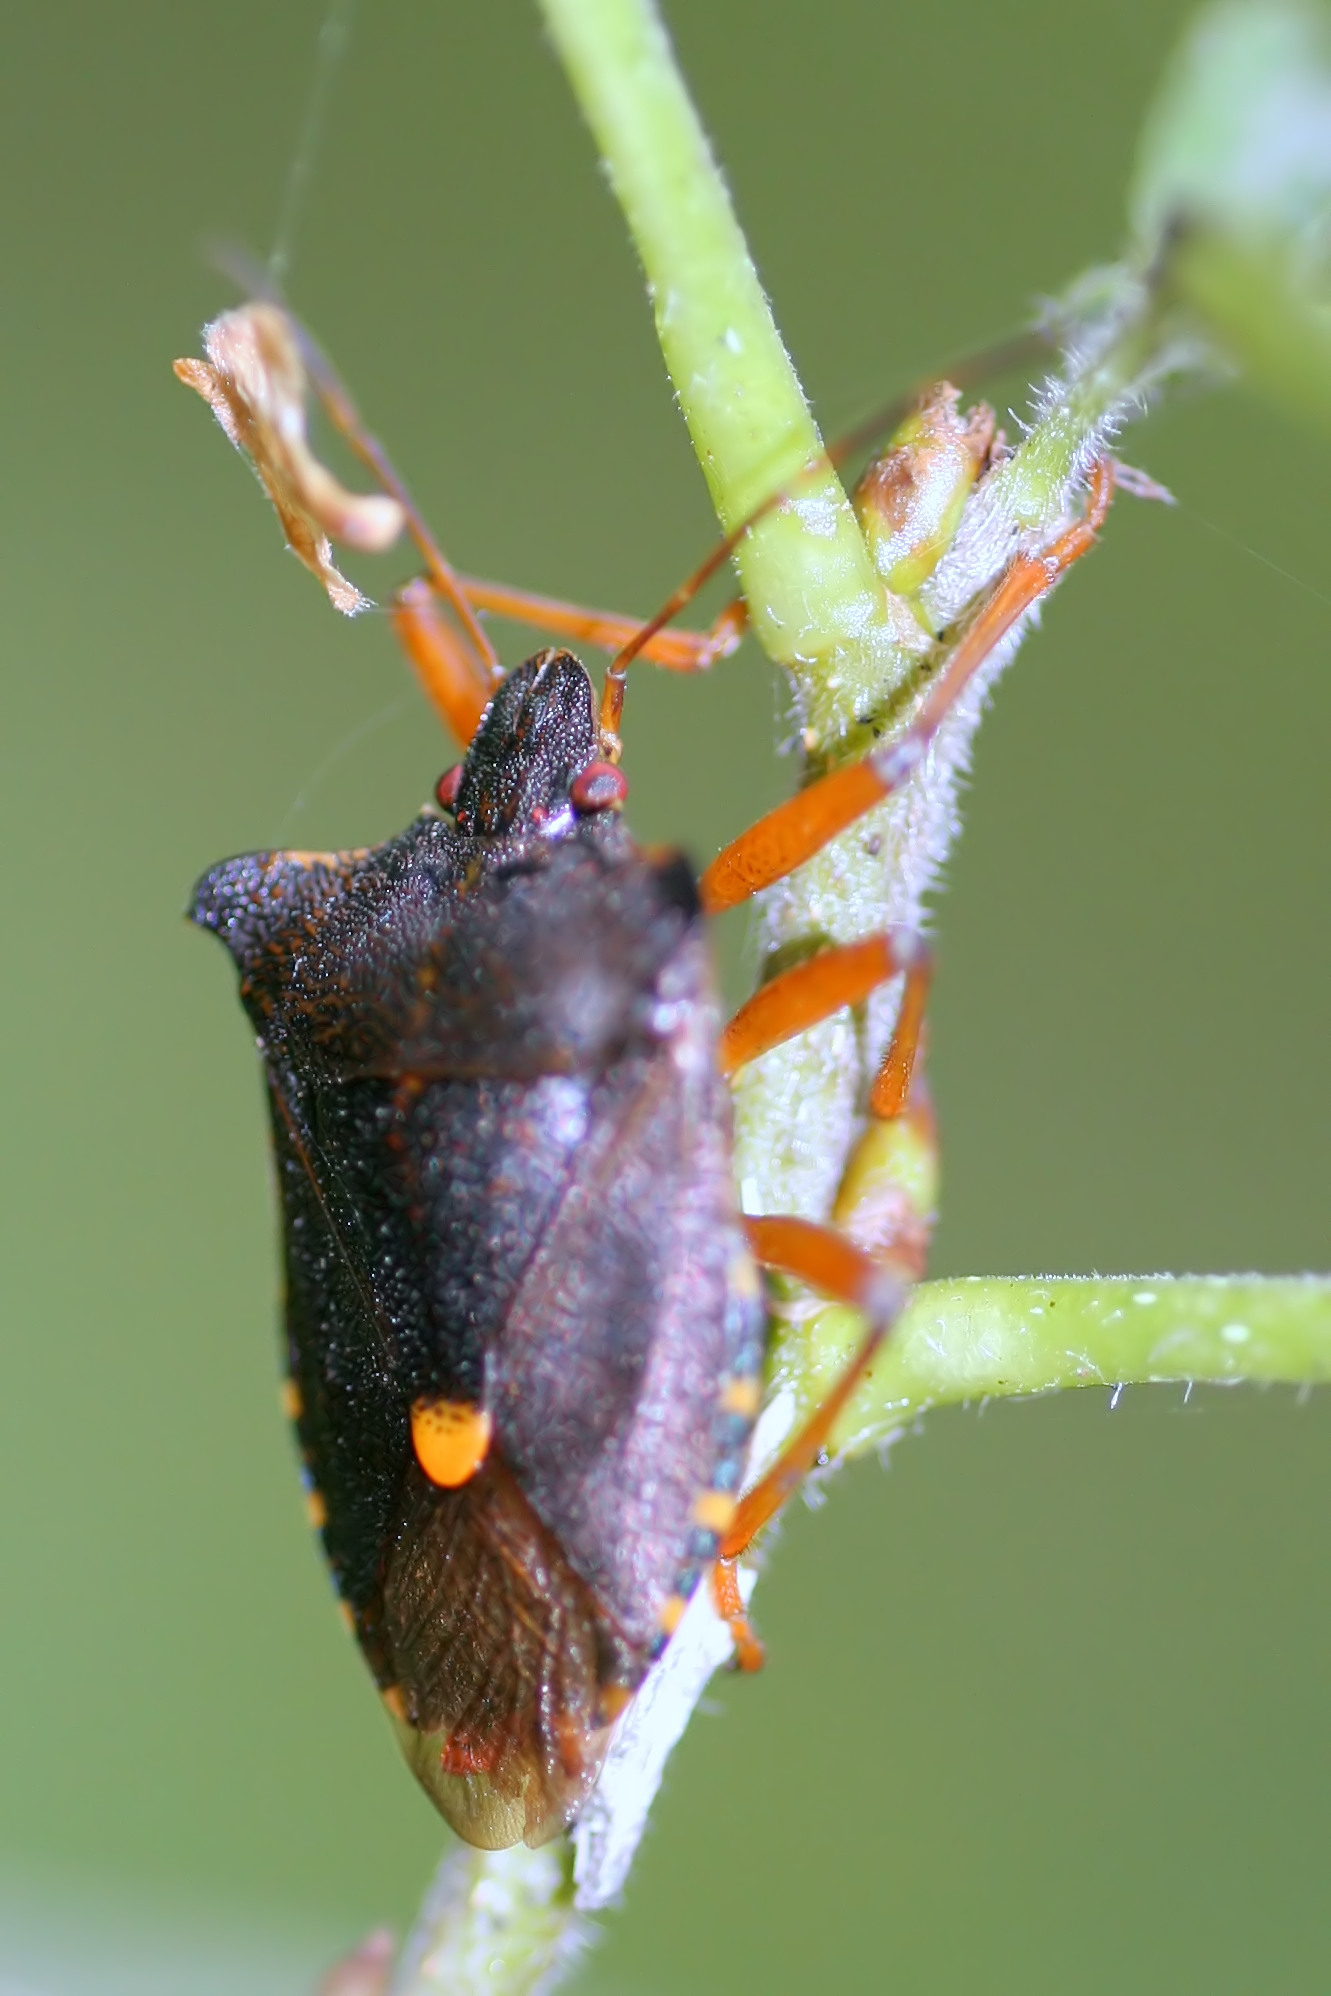 Tarczówka rudonoga (Pentatoma rufipes)